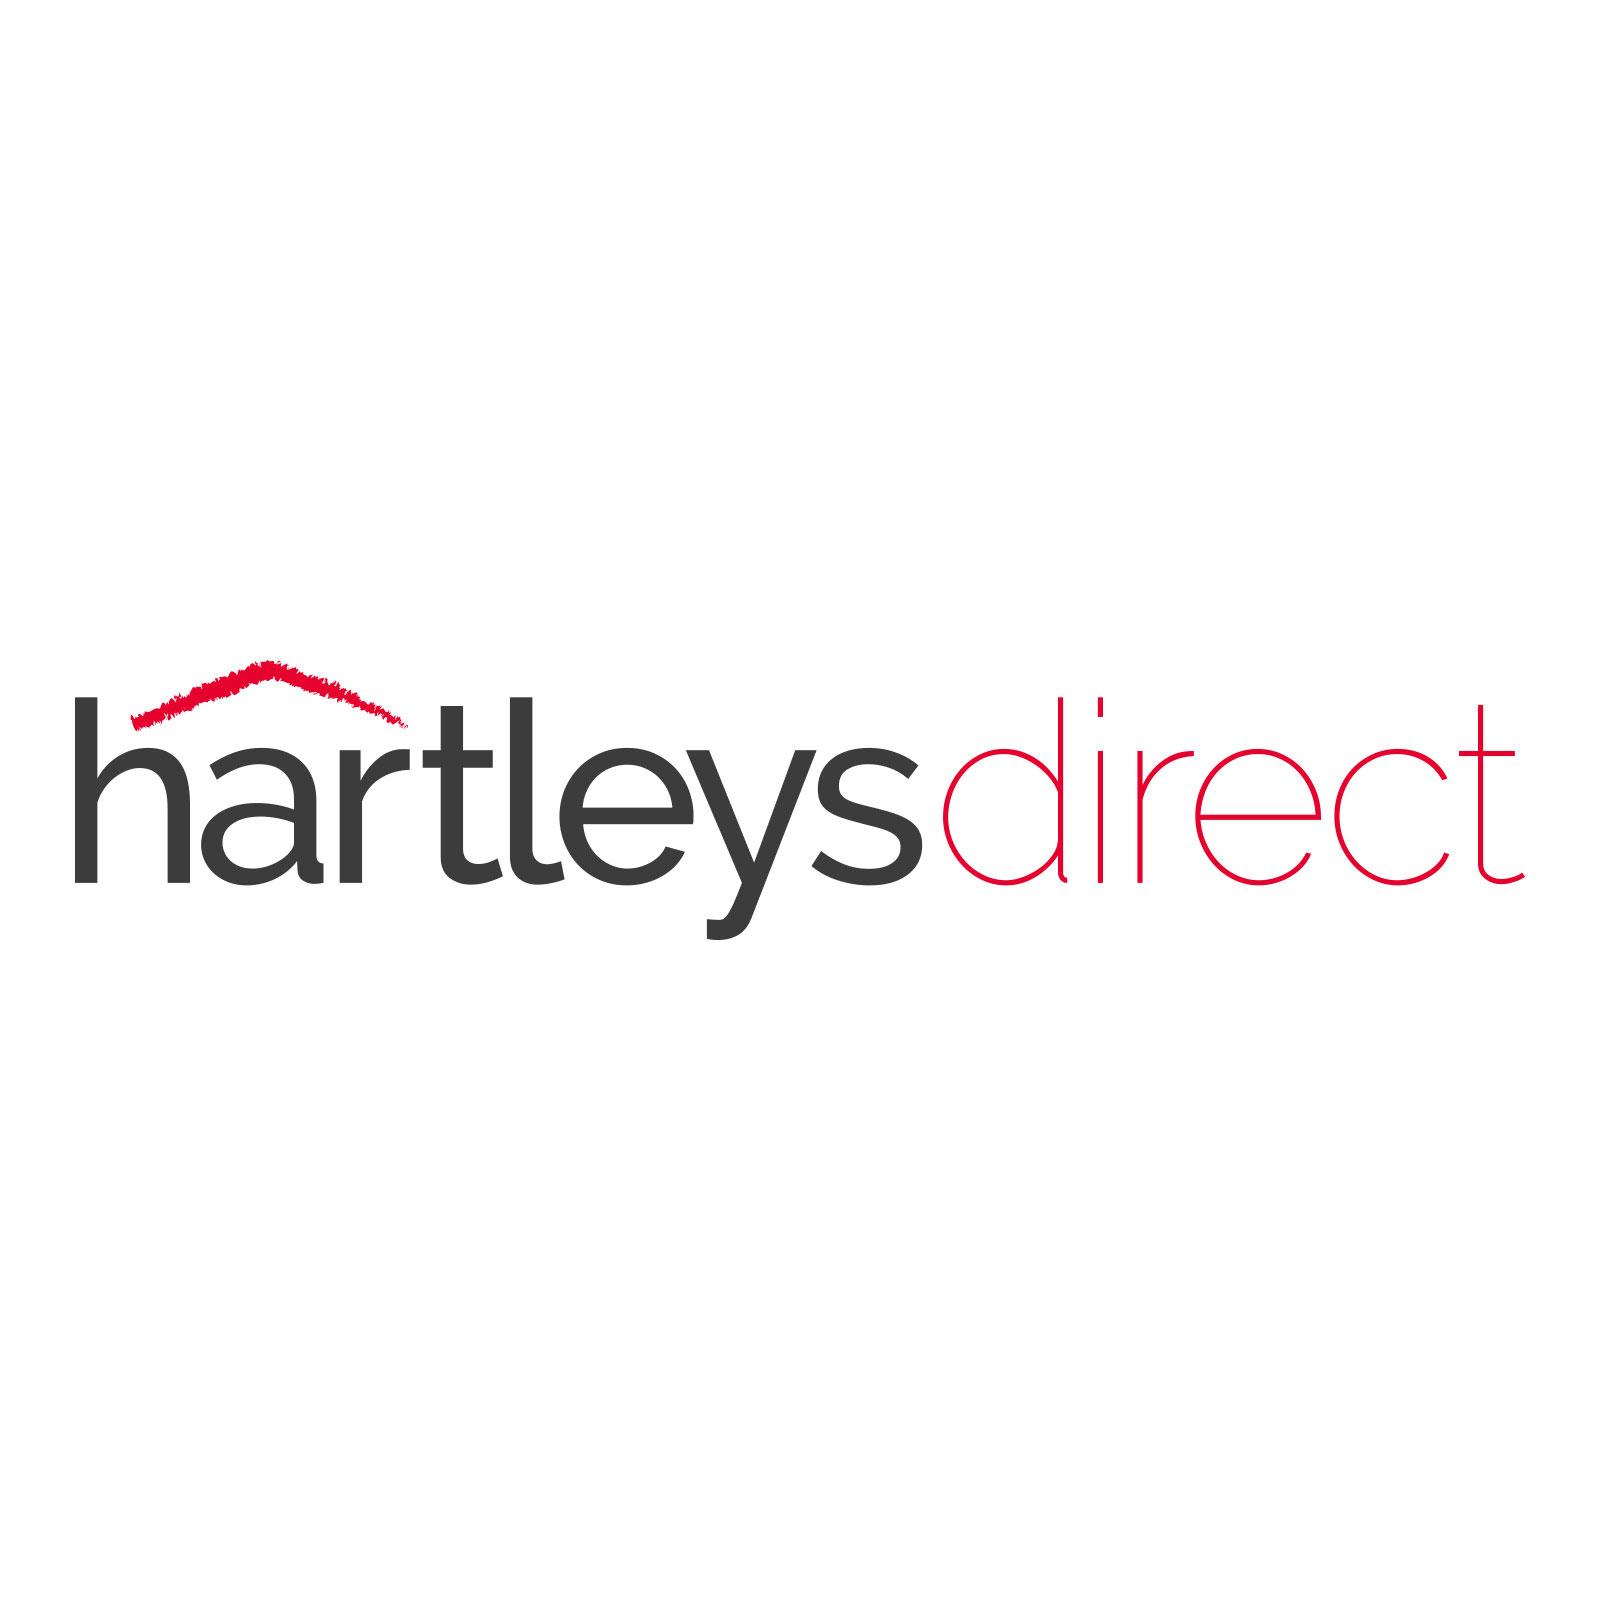 Grey-Hartleys-Fabric-Storage-Box-with-White-Trim-on-White-Background.jpg